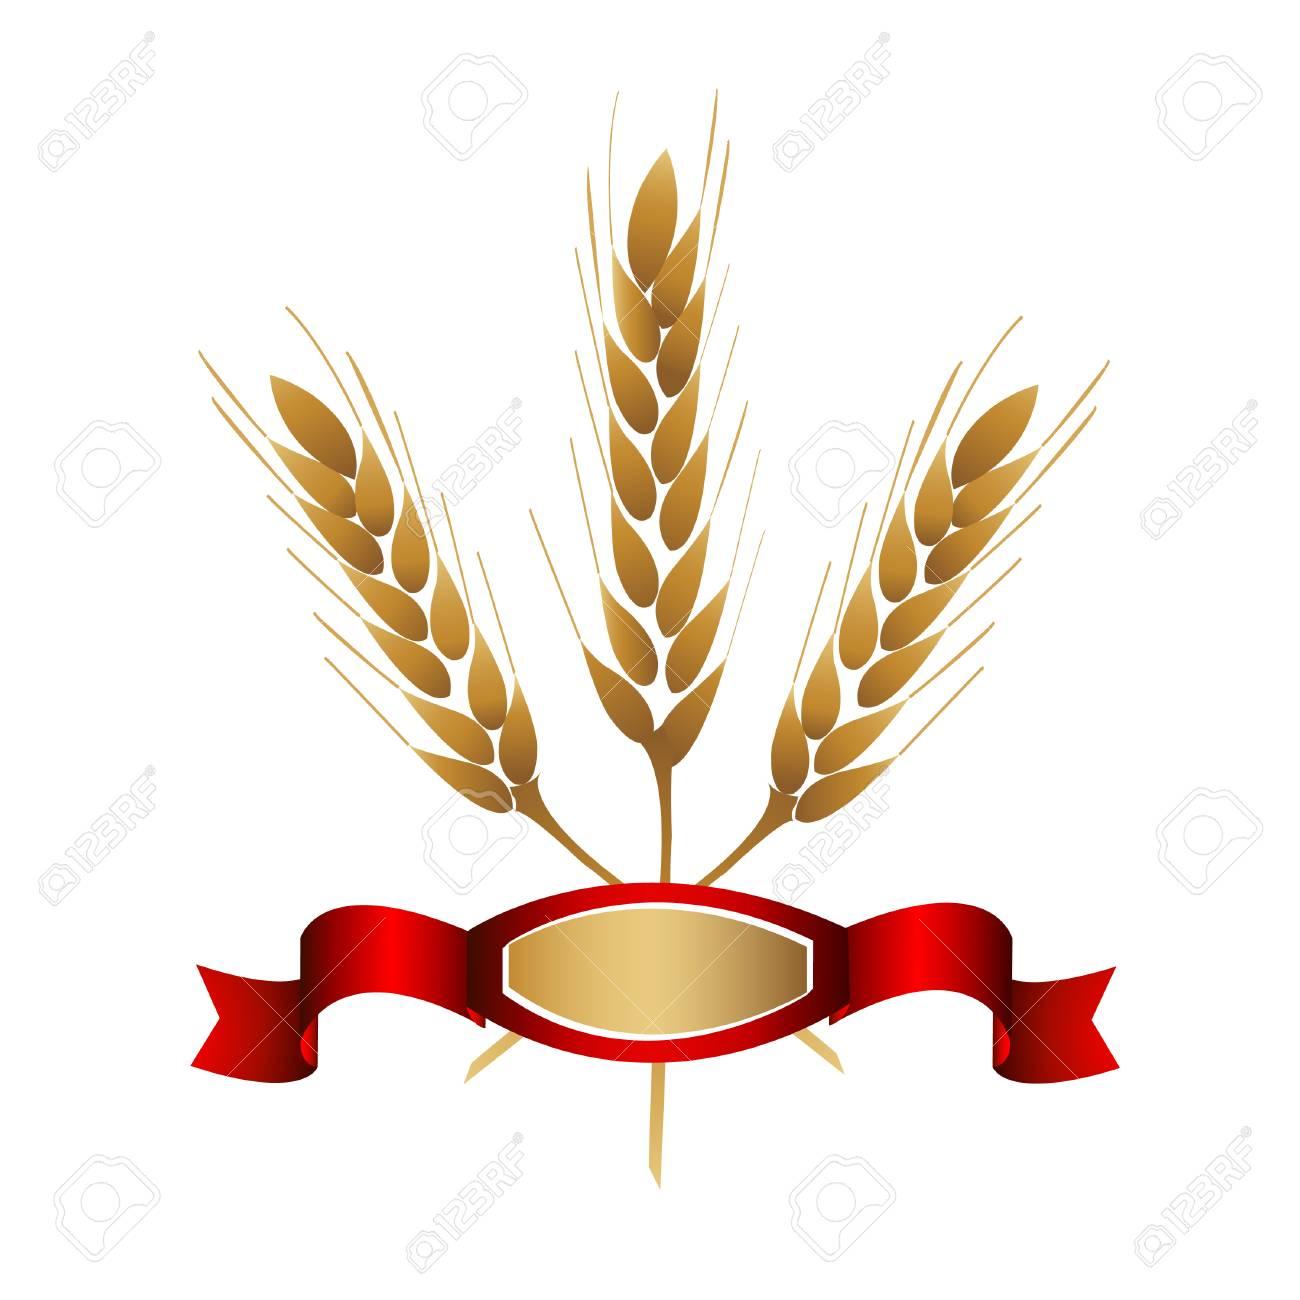 Wheat icon Stock Vector - 8915764